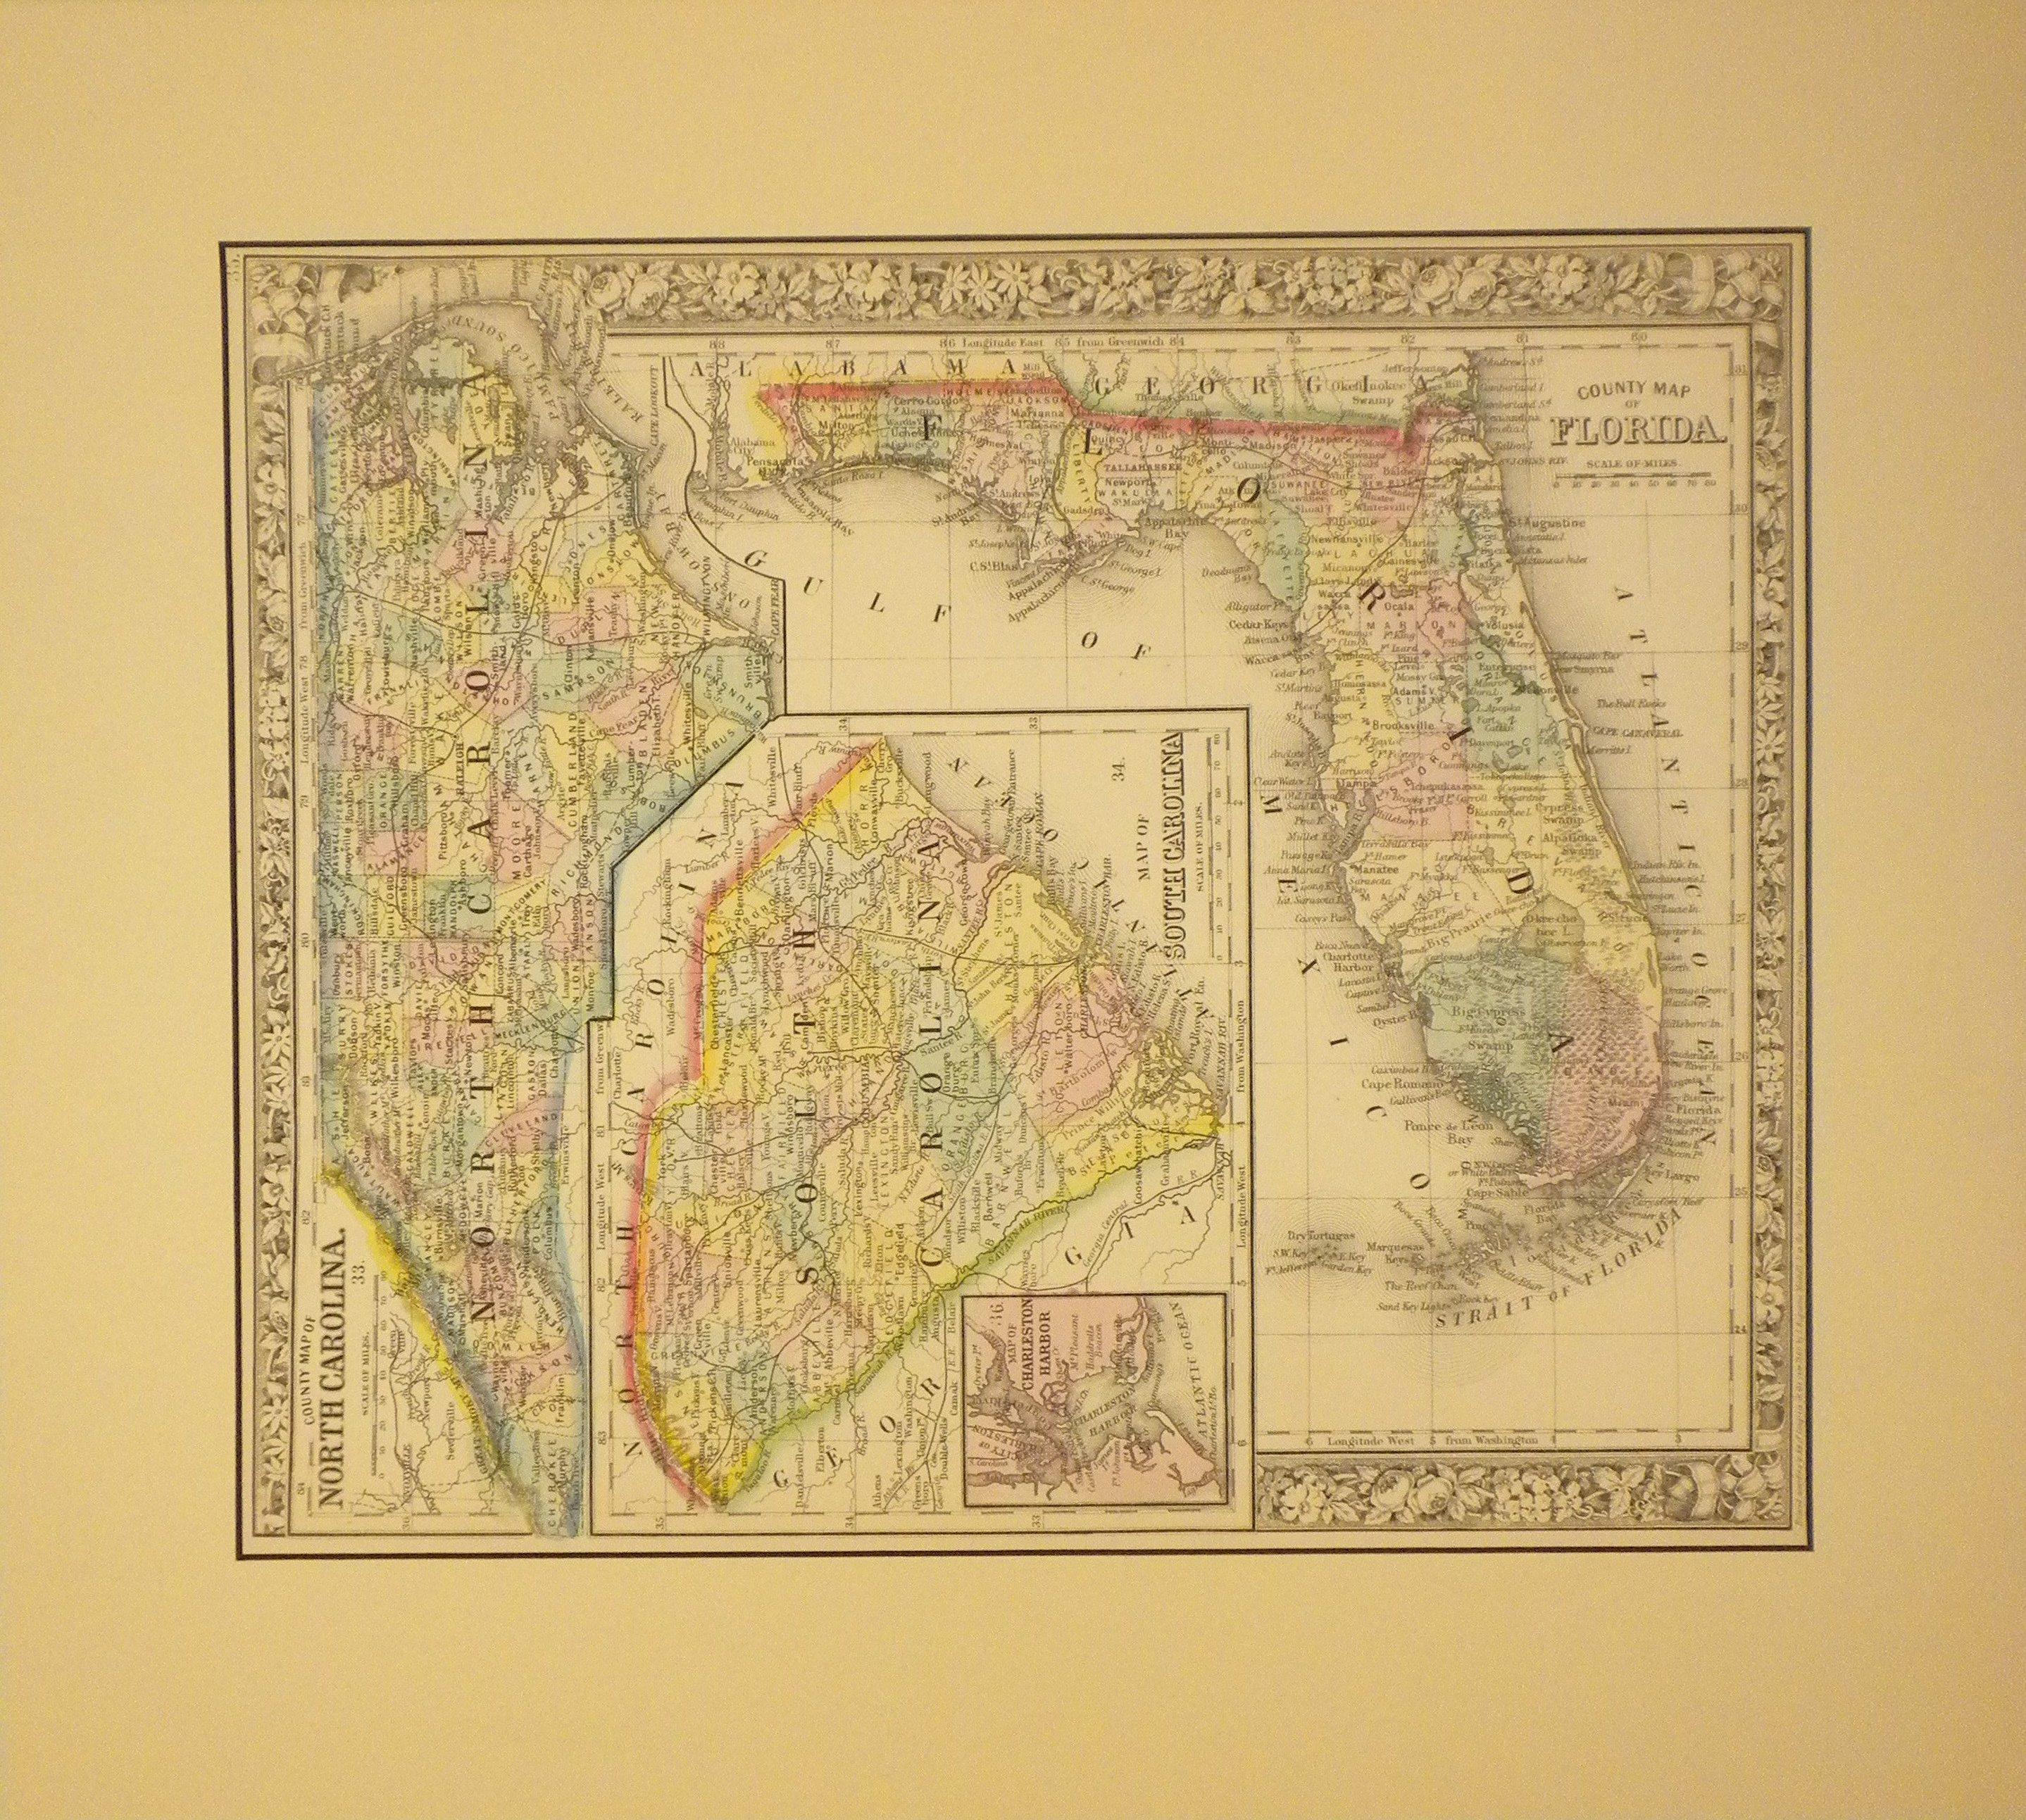 1860 County Map of North Carolina, South Carolina, & Florida by ...